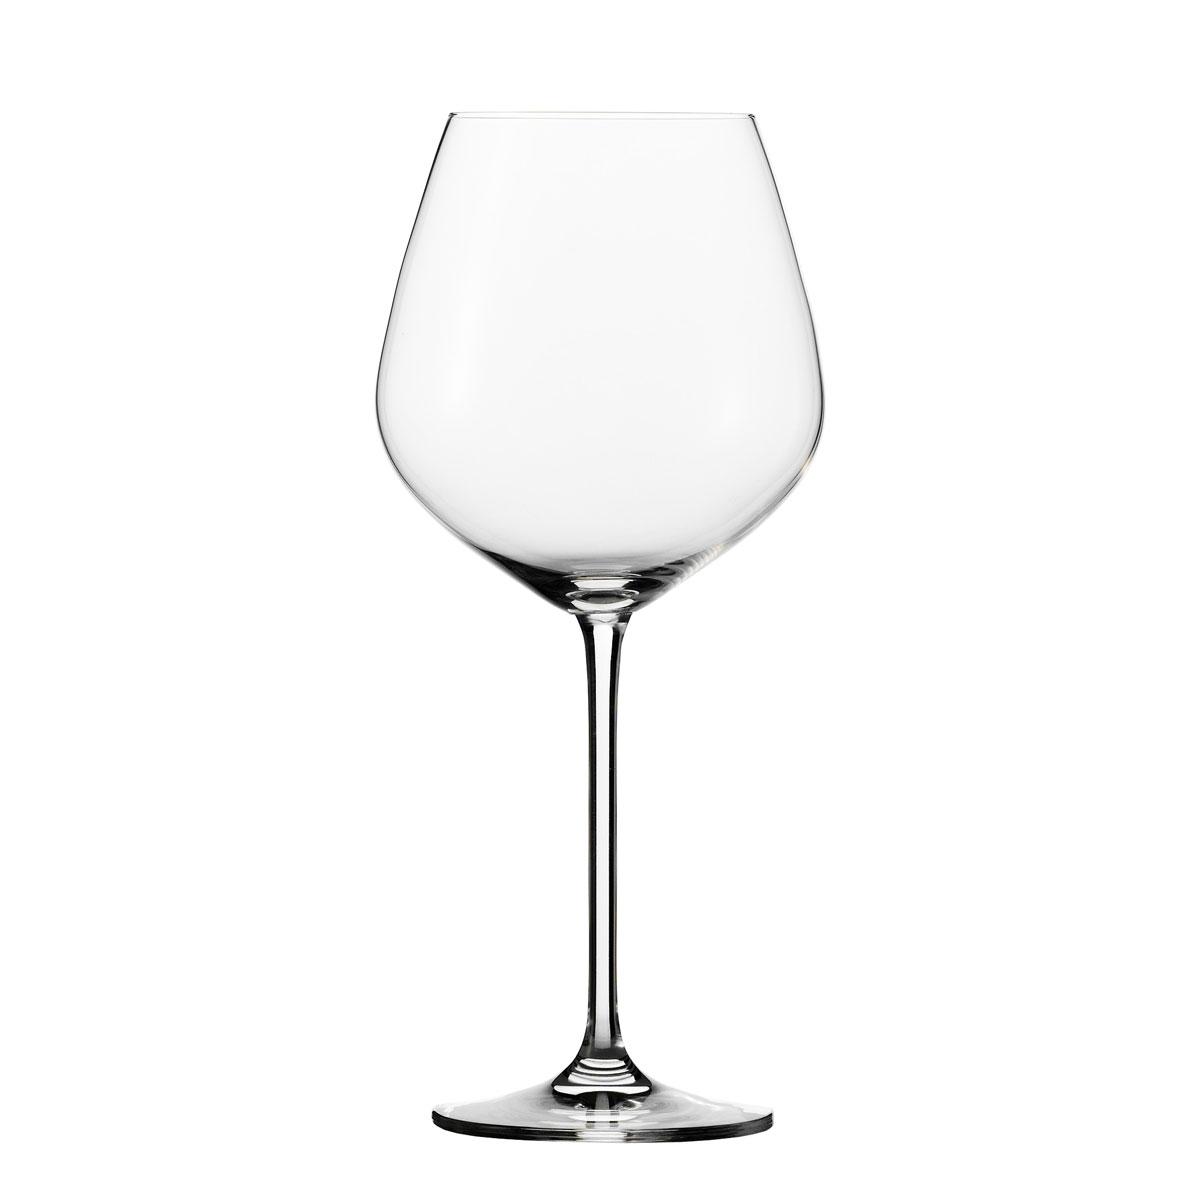 Schott Zwiesel Tritan Crystal, Fortissimo Burgundy, Pinot Noir, Single